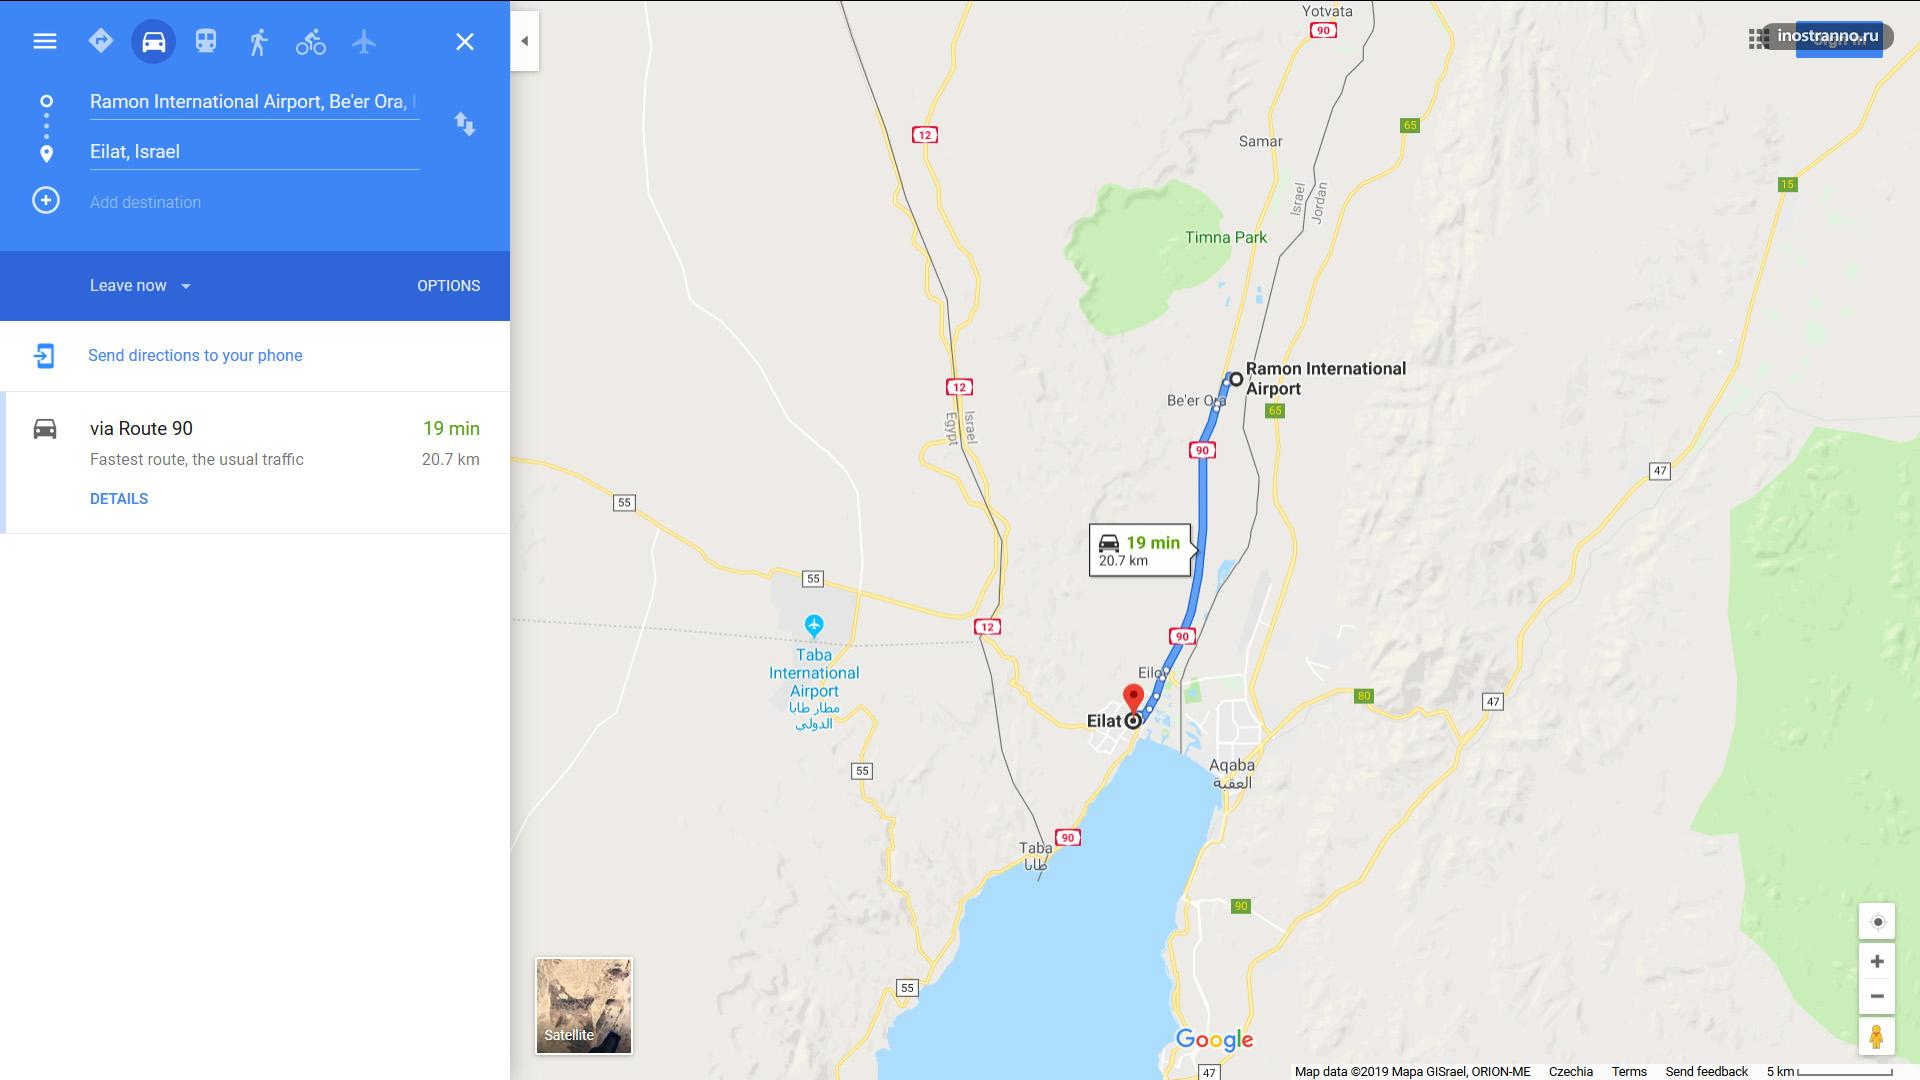 Аэропорт Рамон в Эйлате расстояние от города и время в пути